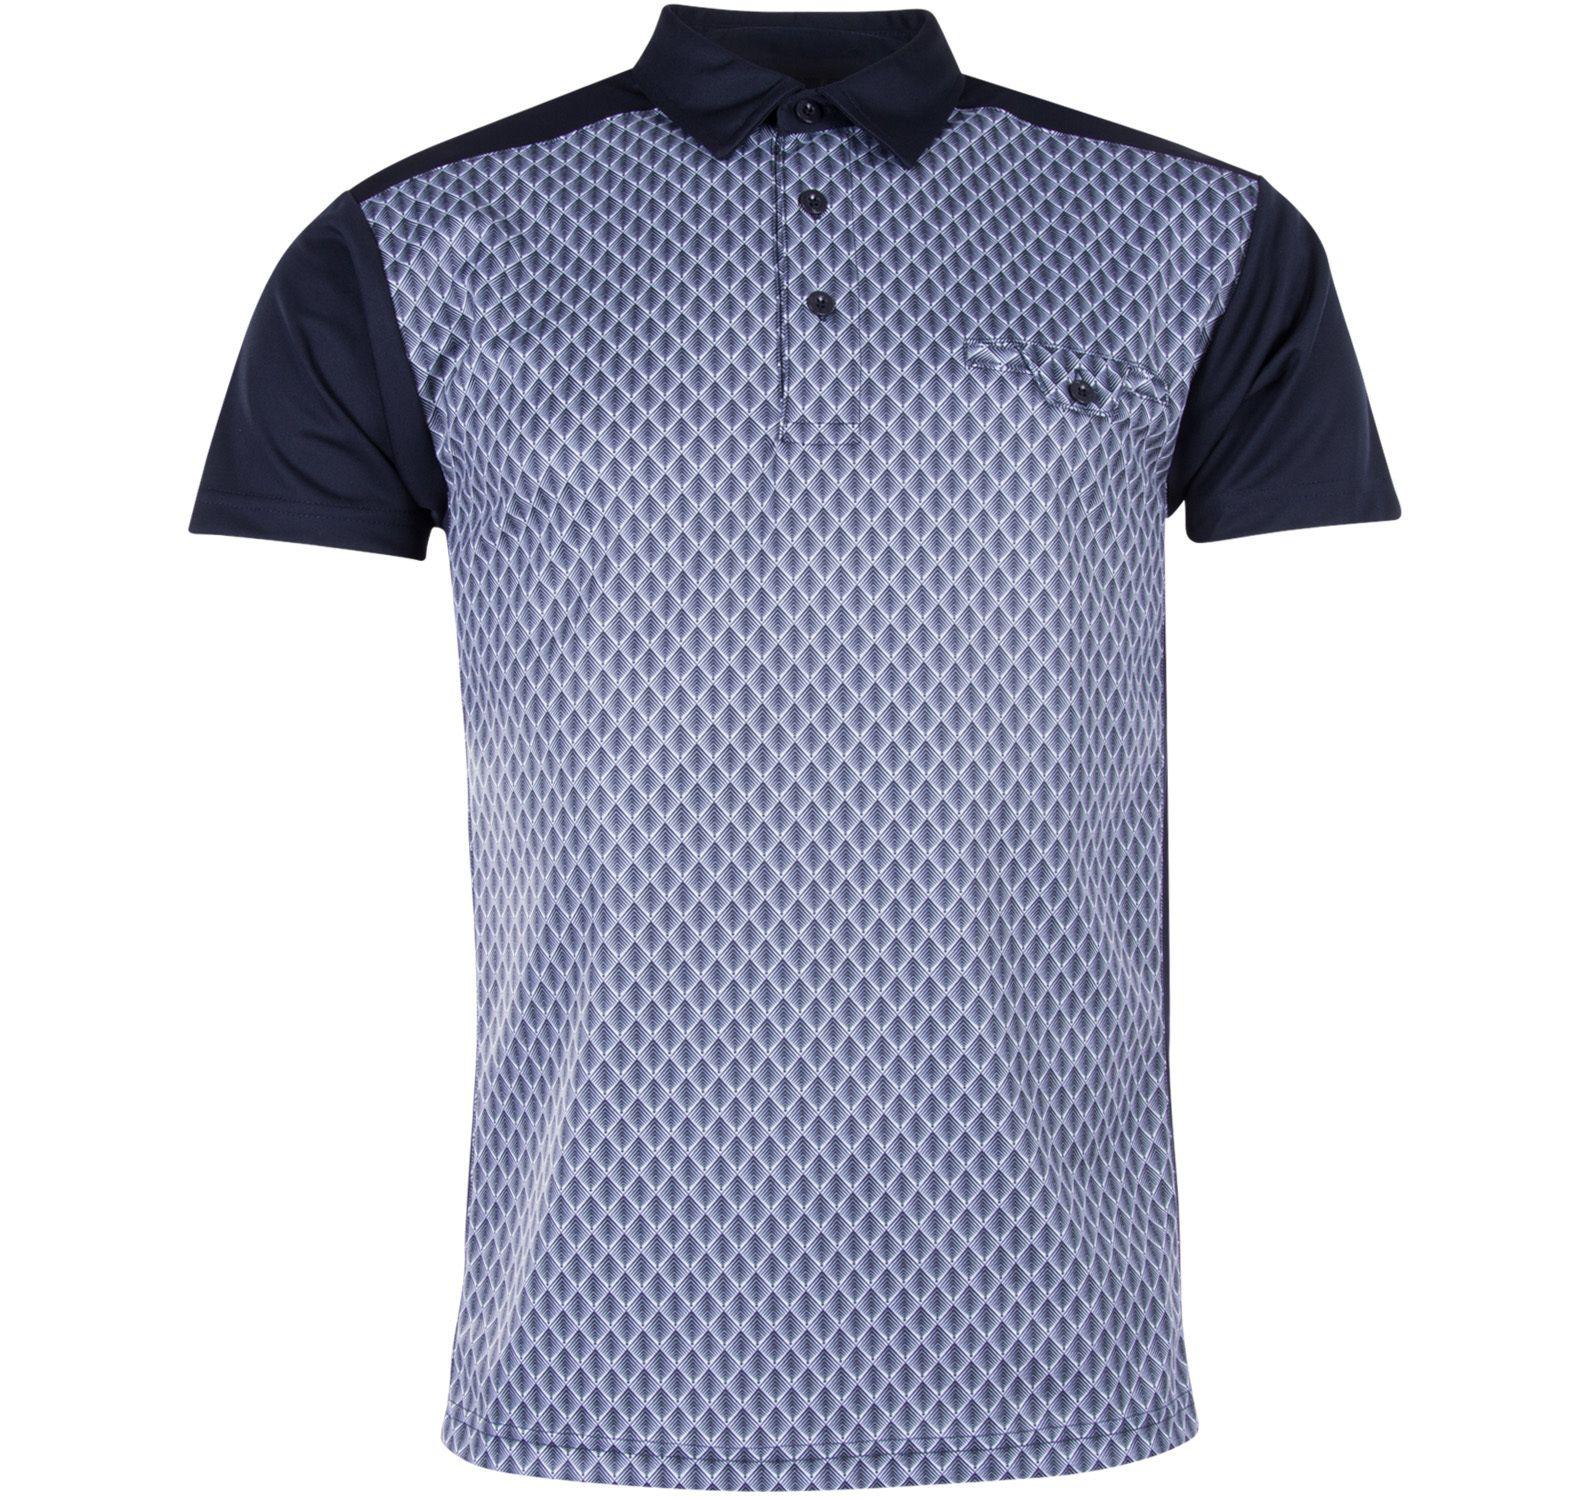 shirt 1811 navy, navy, s, pikétröjor